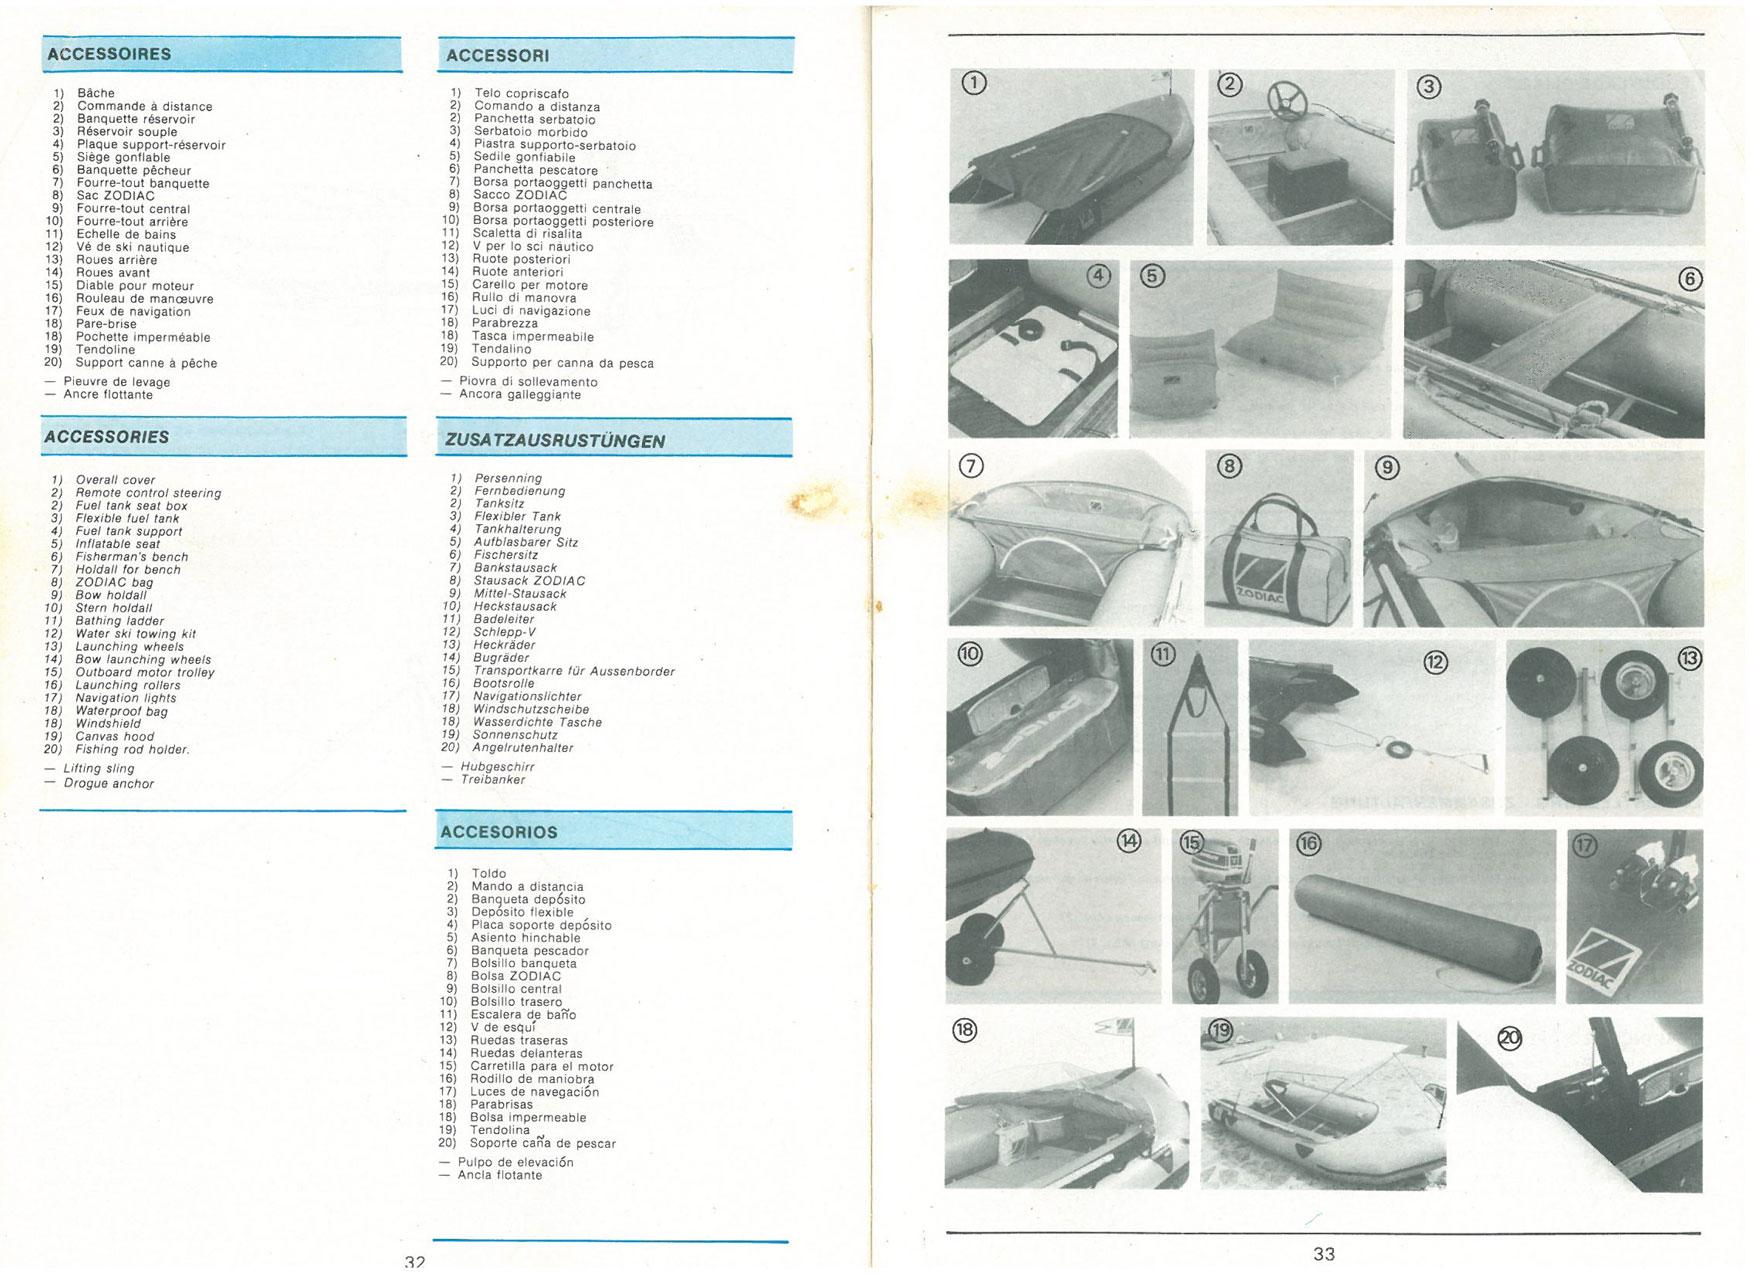 Zodiac MKI & MKII Owners Manual - RIBnet Forums